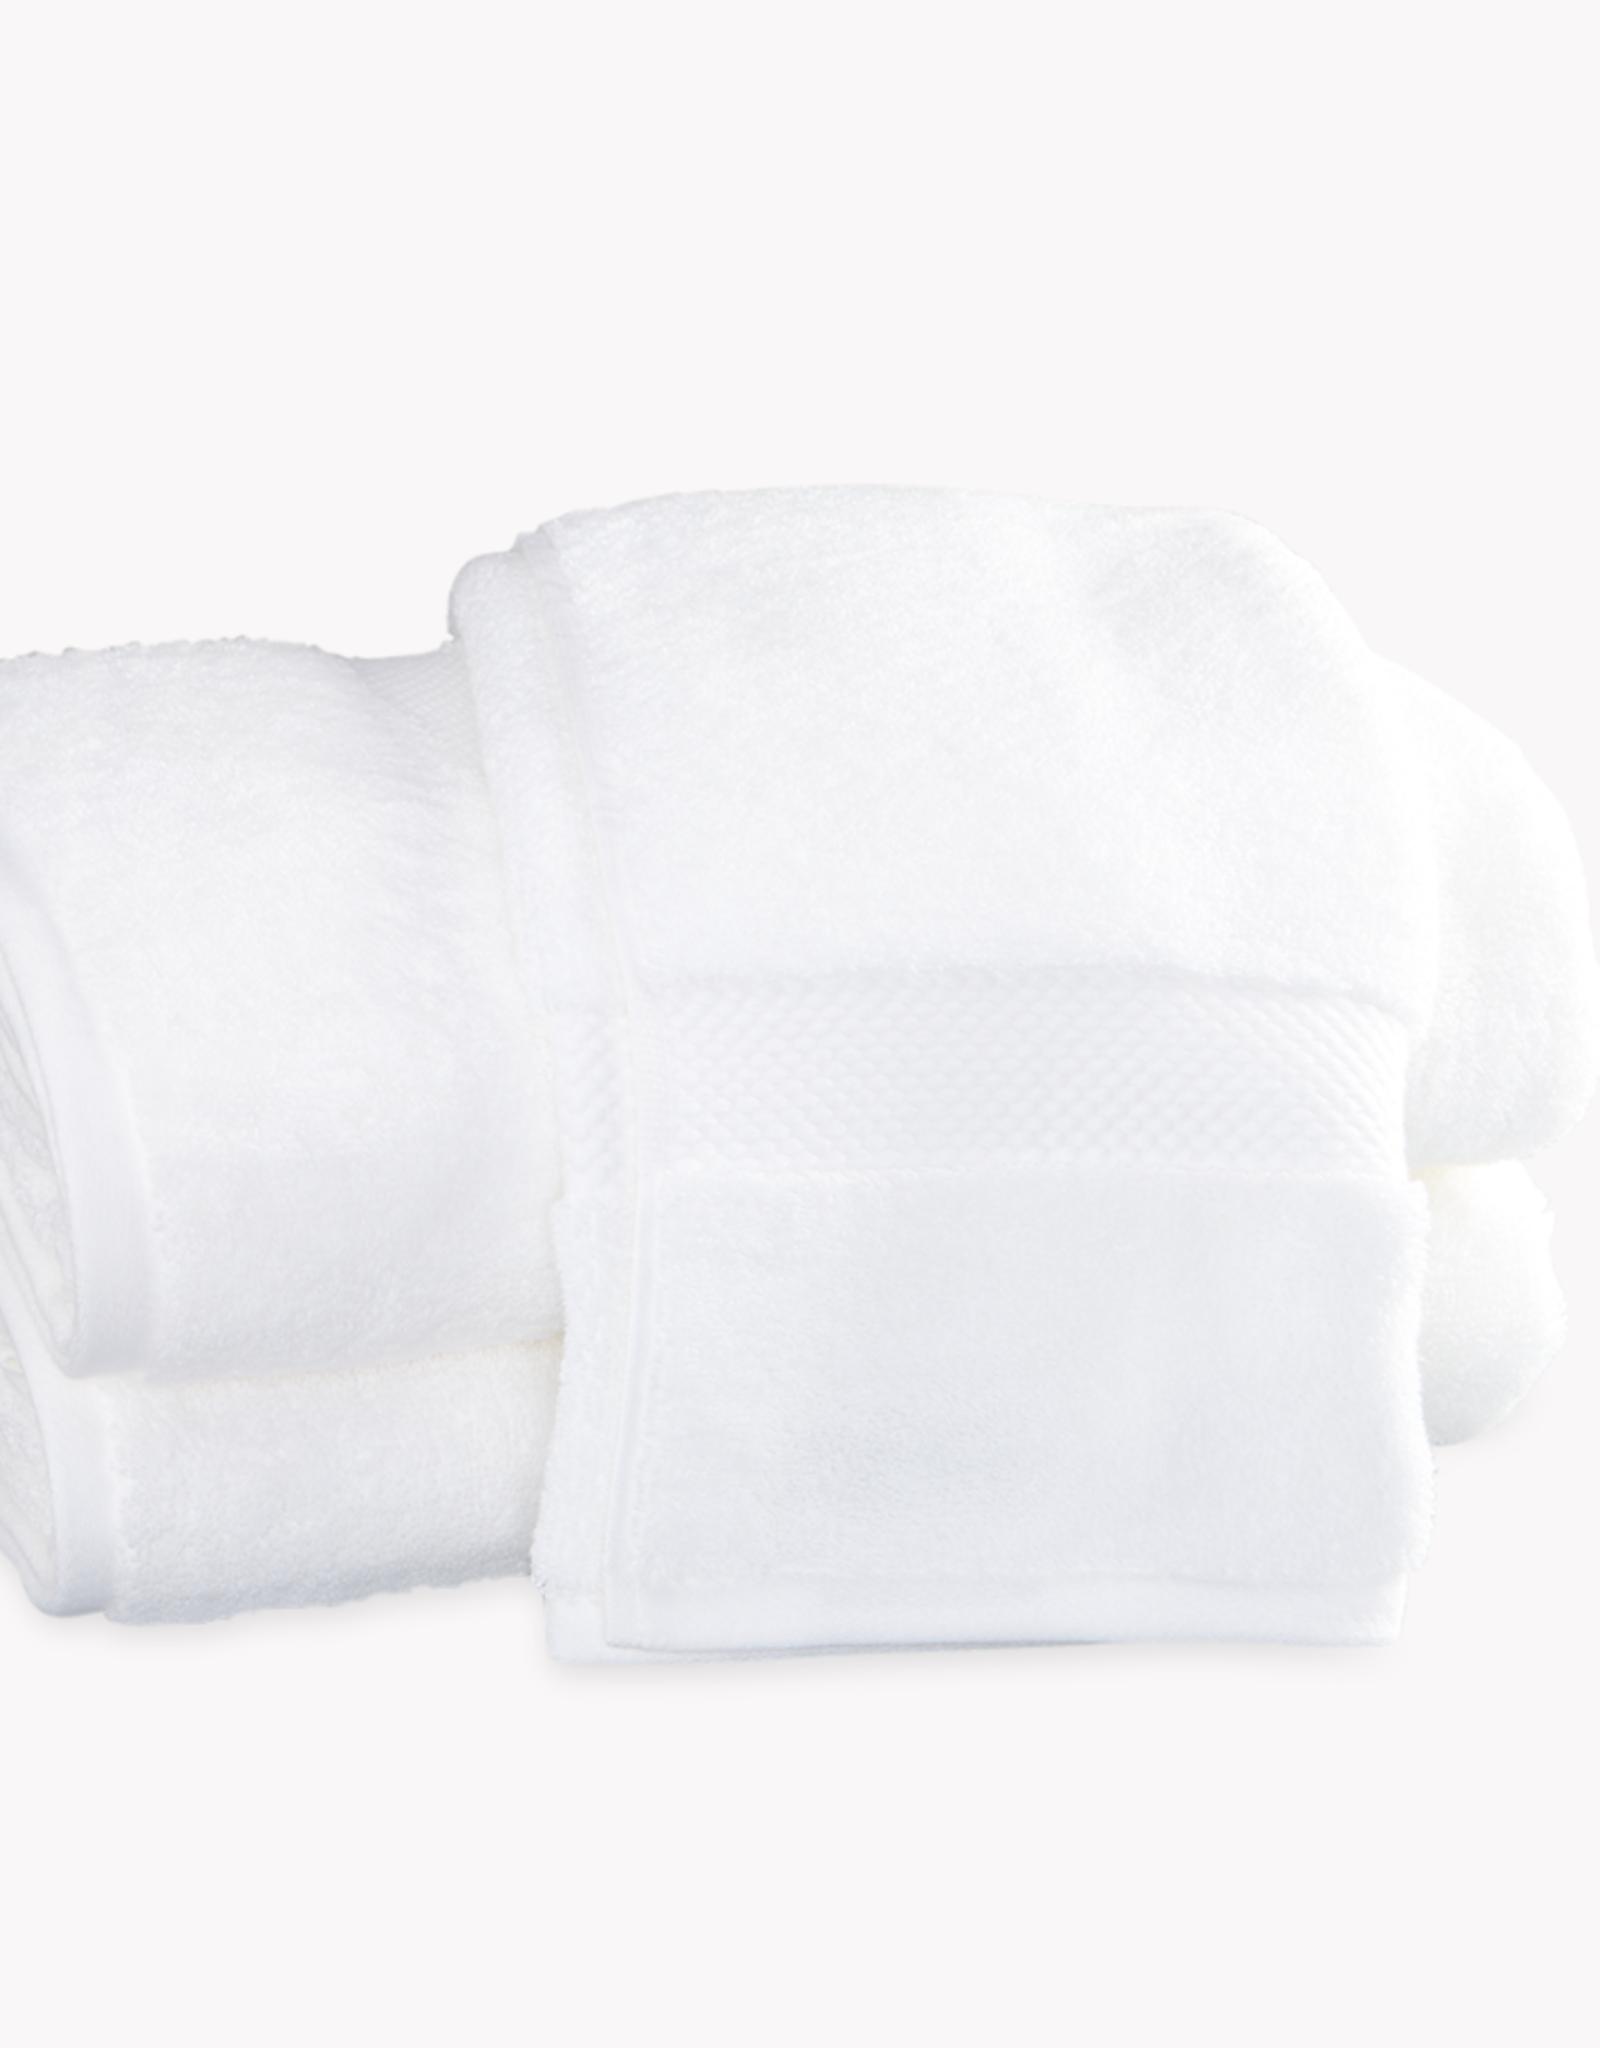 Matouk Guesthouse Hand Towel